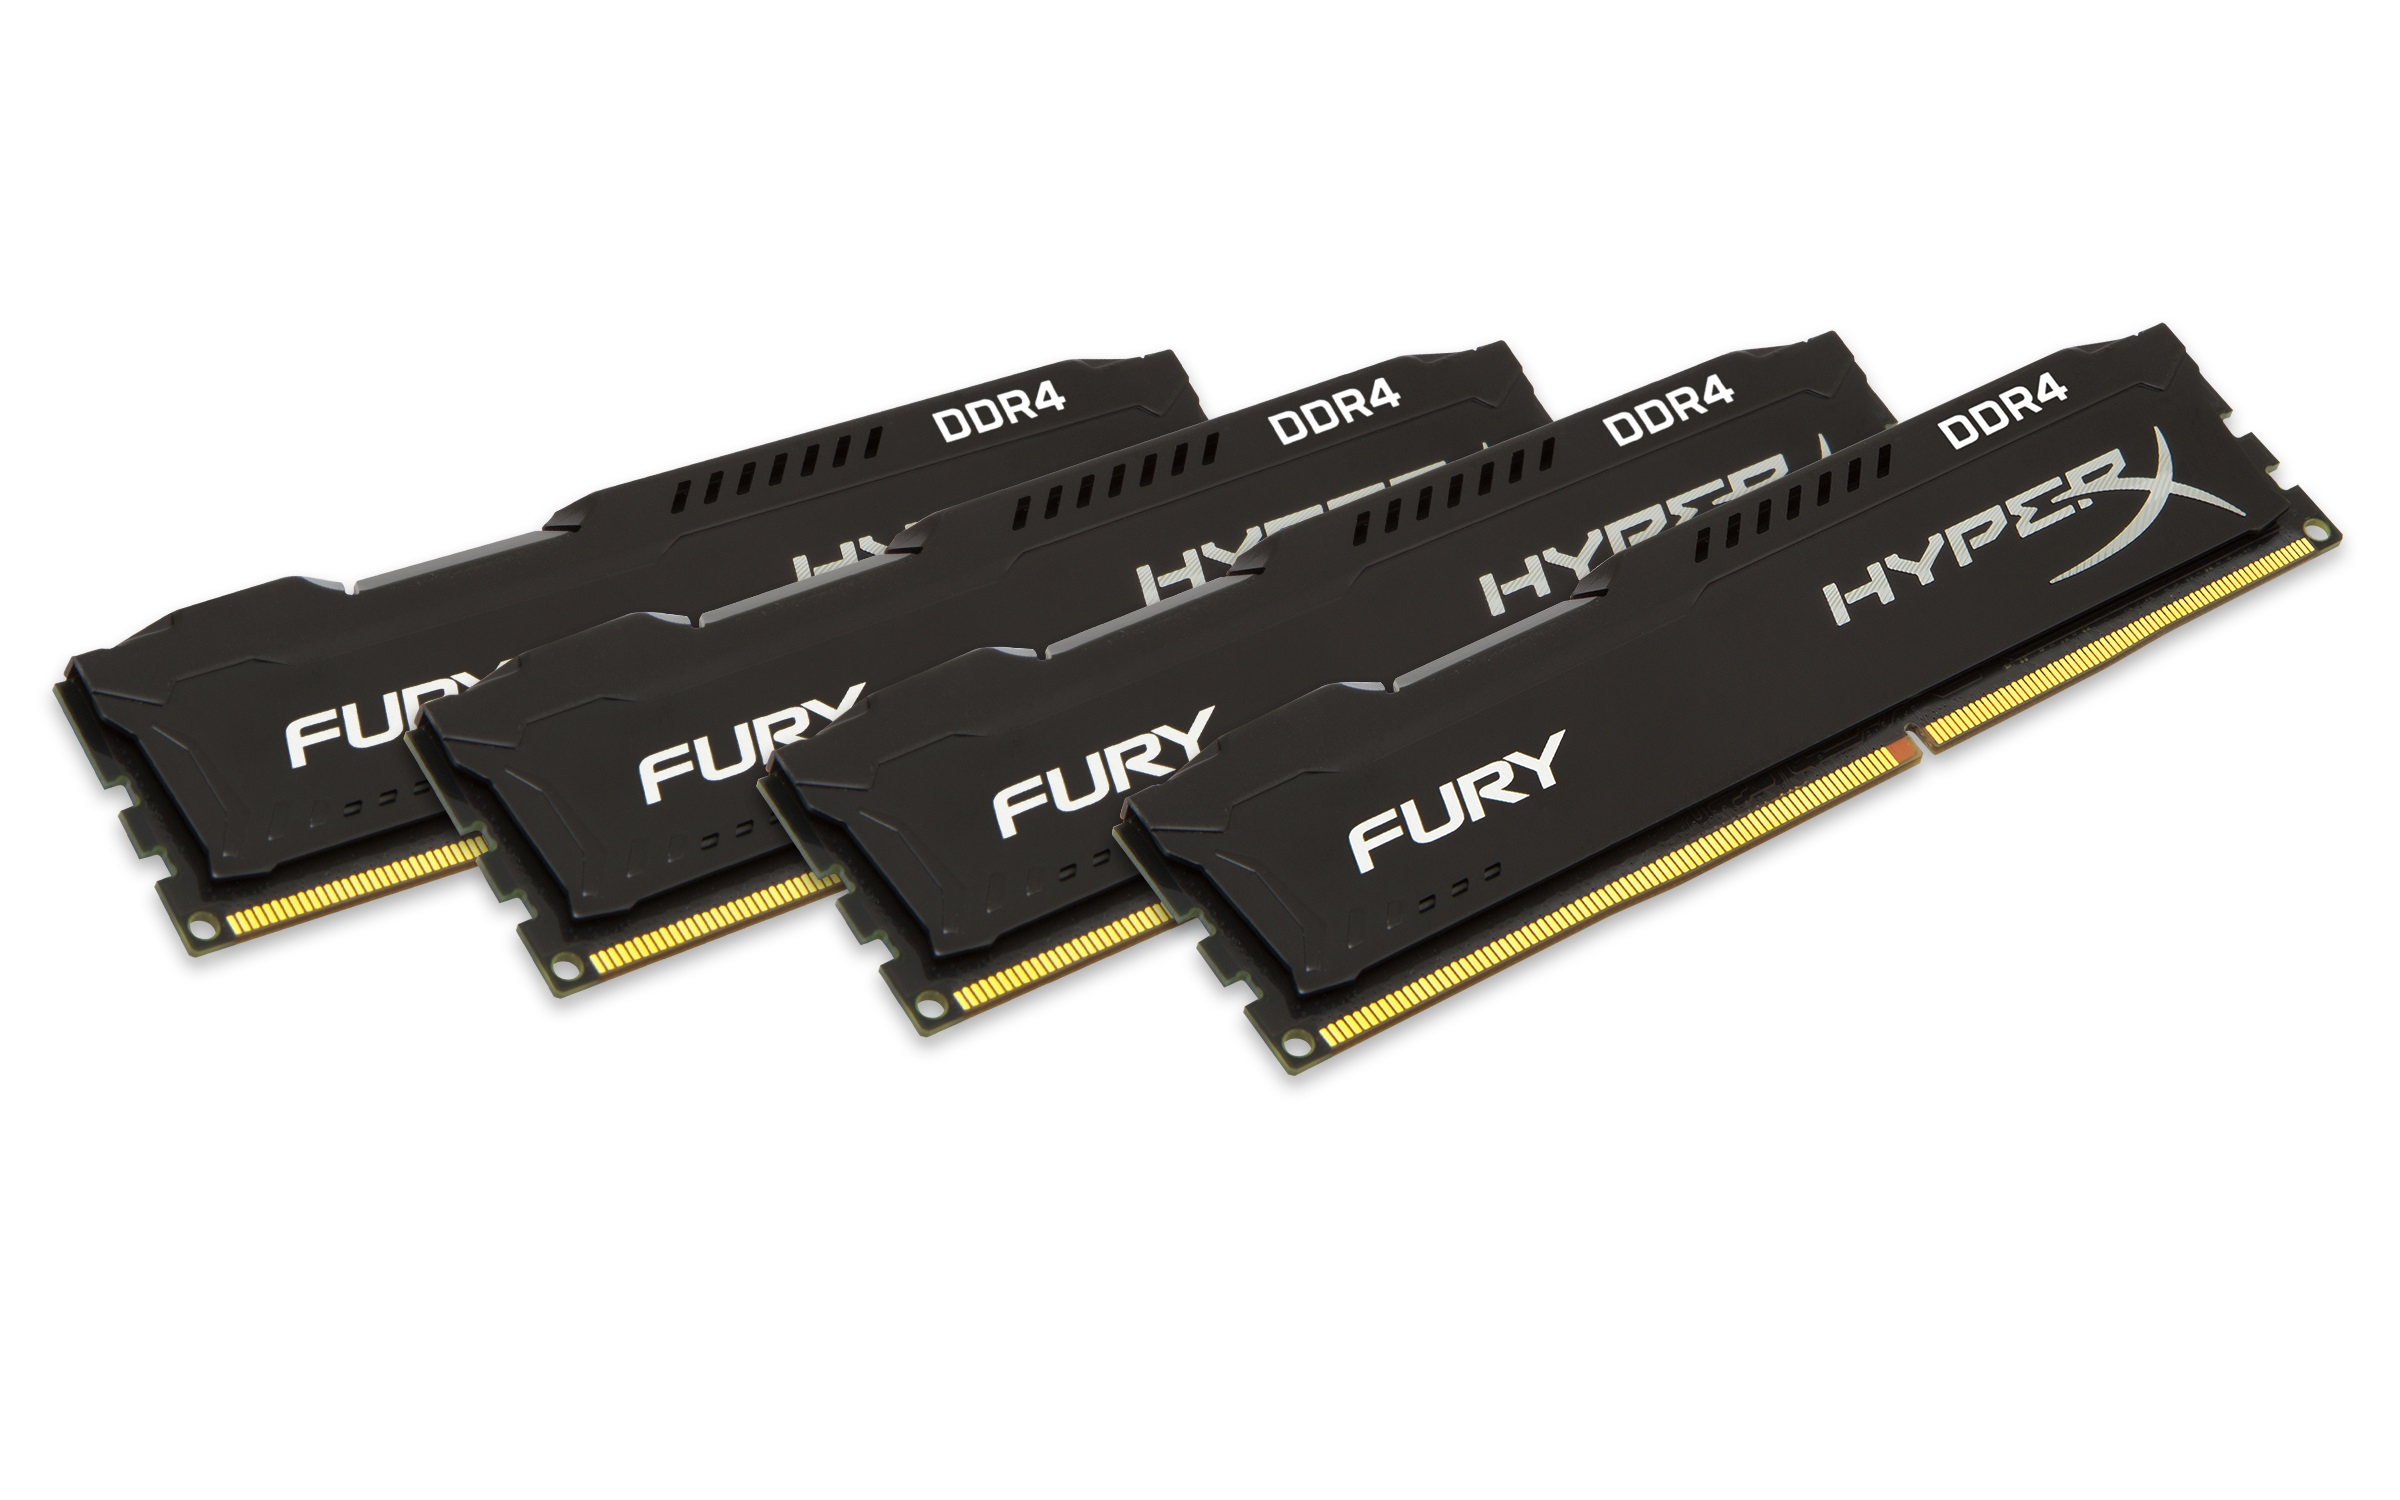 HyperX FURY HX424C15FBK4/16 Black Series 16GB (4x4GB) 2400 MHz DIMM Memory Kit